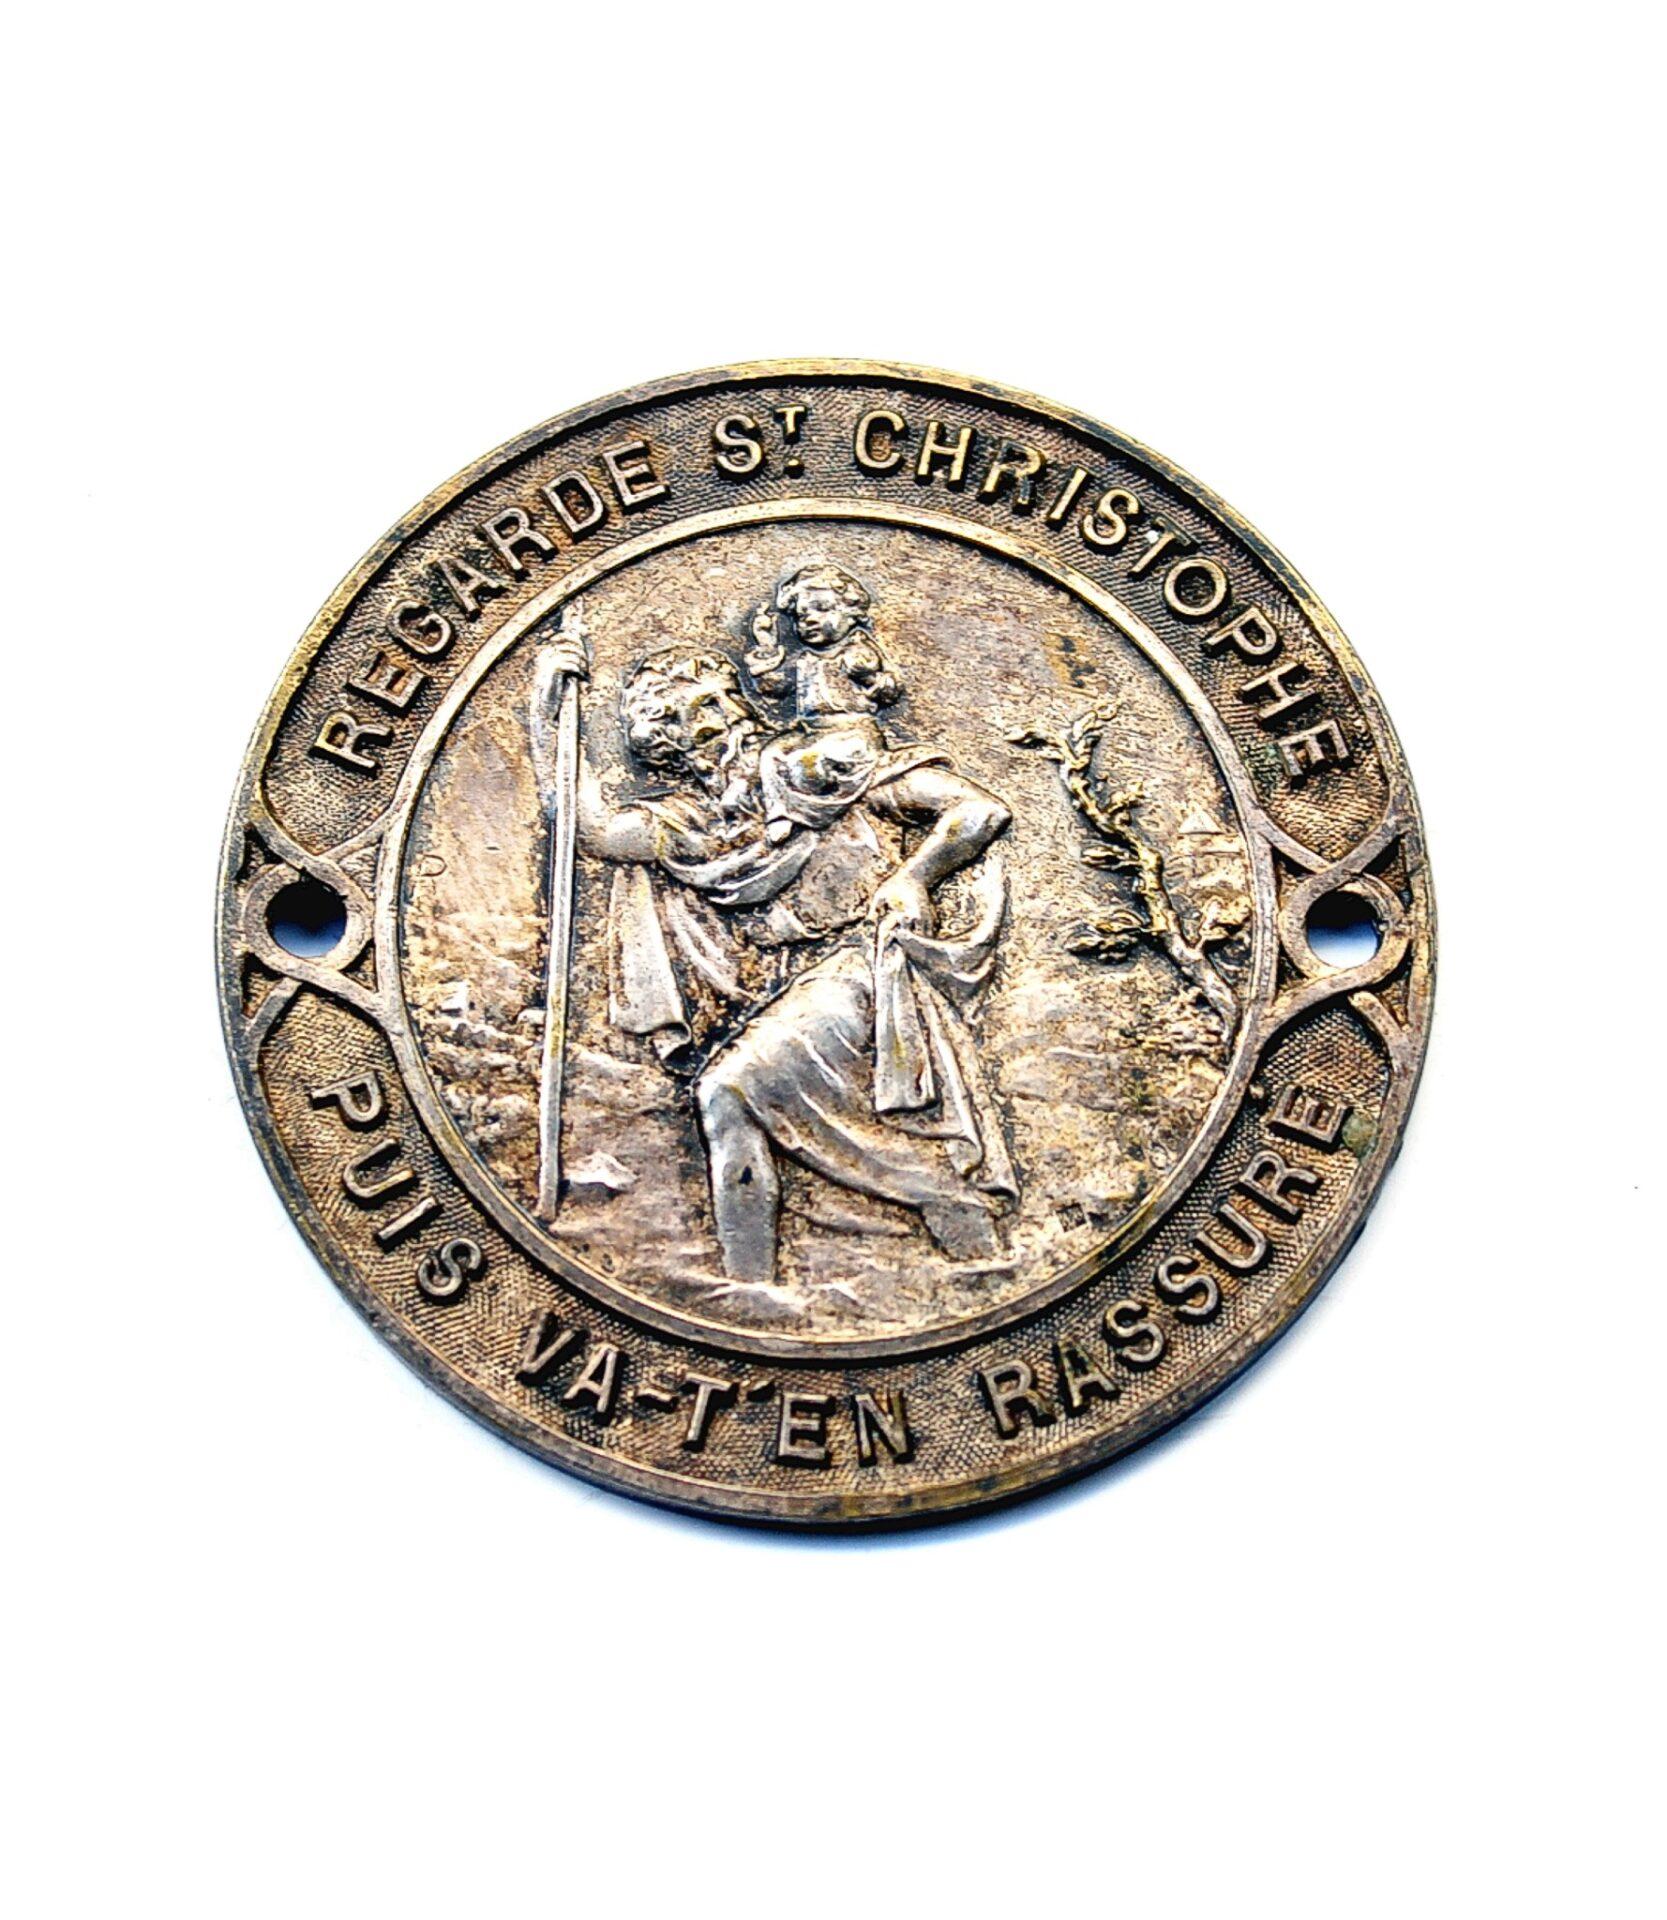 French Saint Christopher dashboard badge